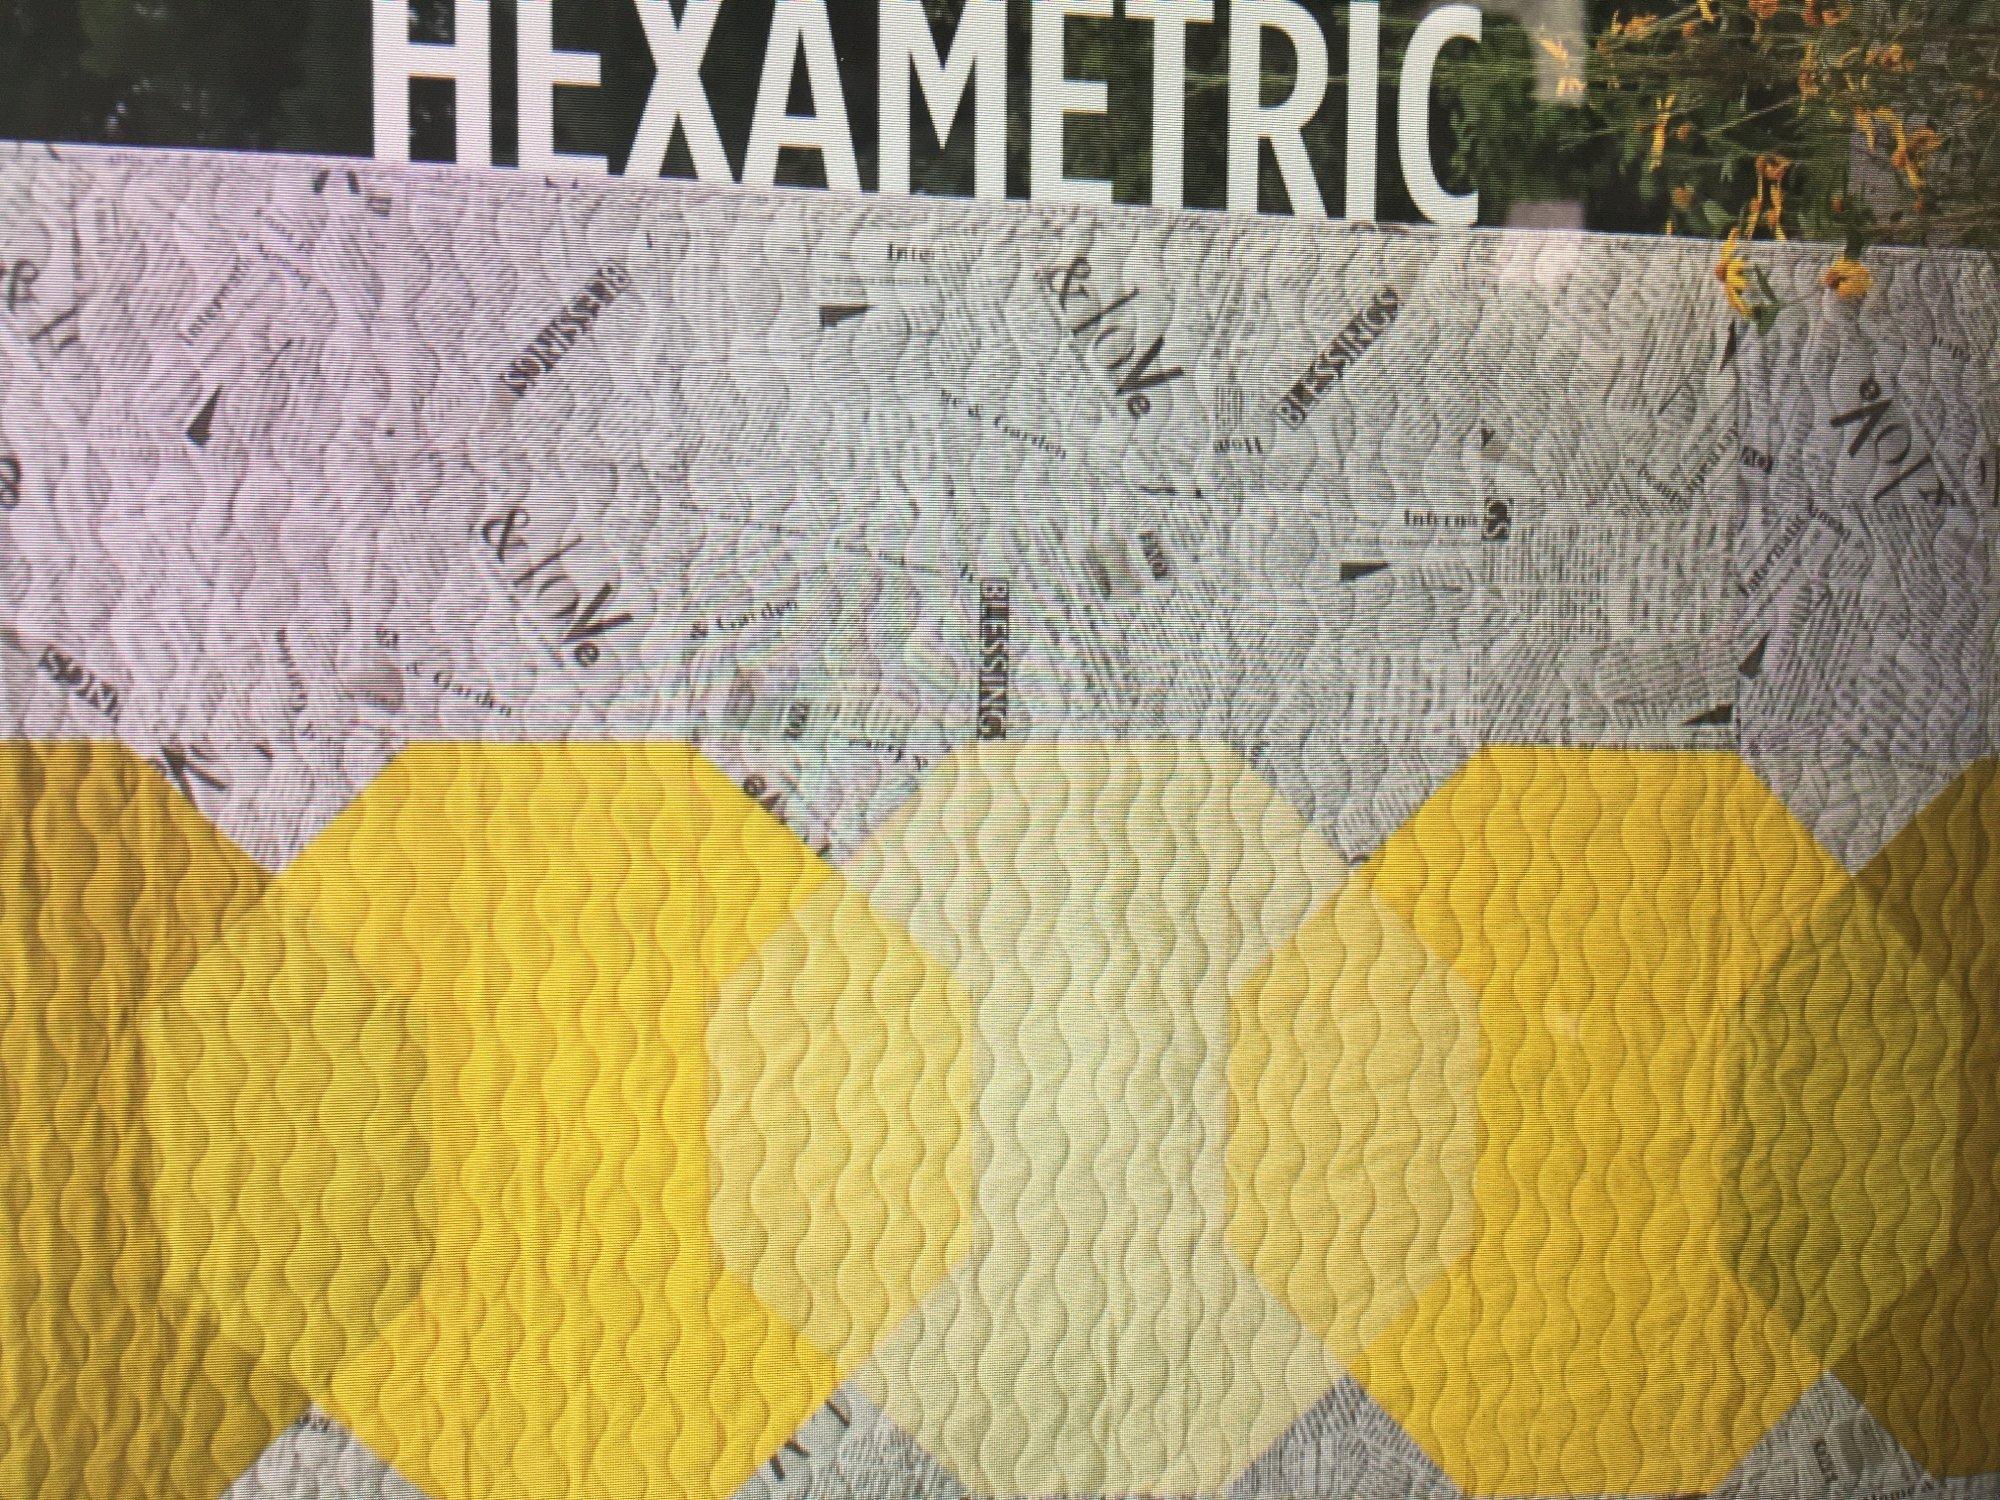 Hexametric Quilt Pattern - Studio 26 by Lethargic Lass - PDF Download